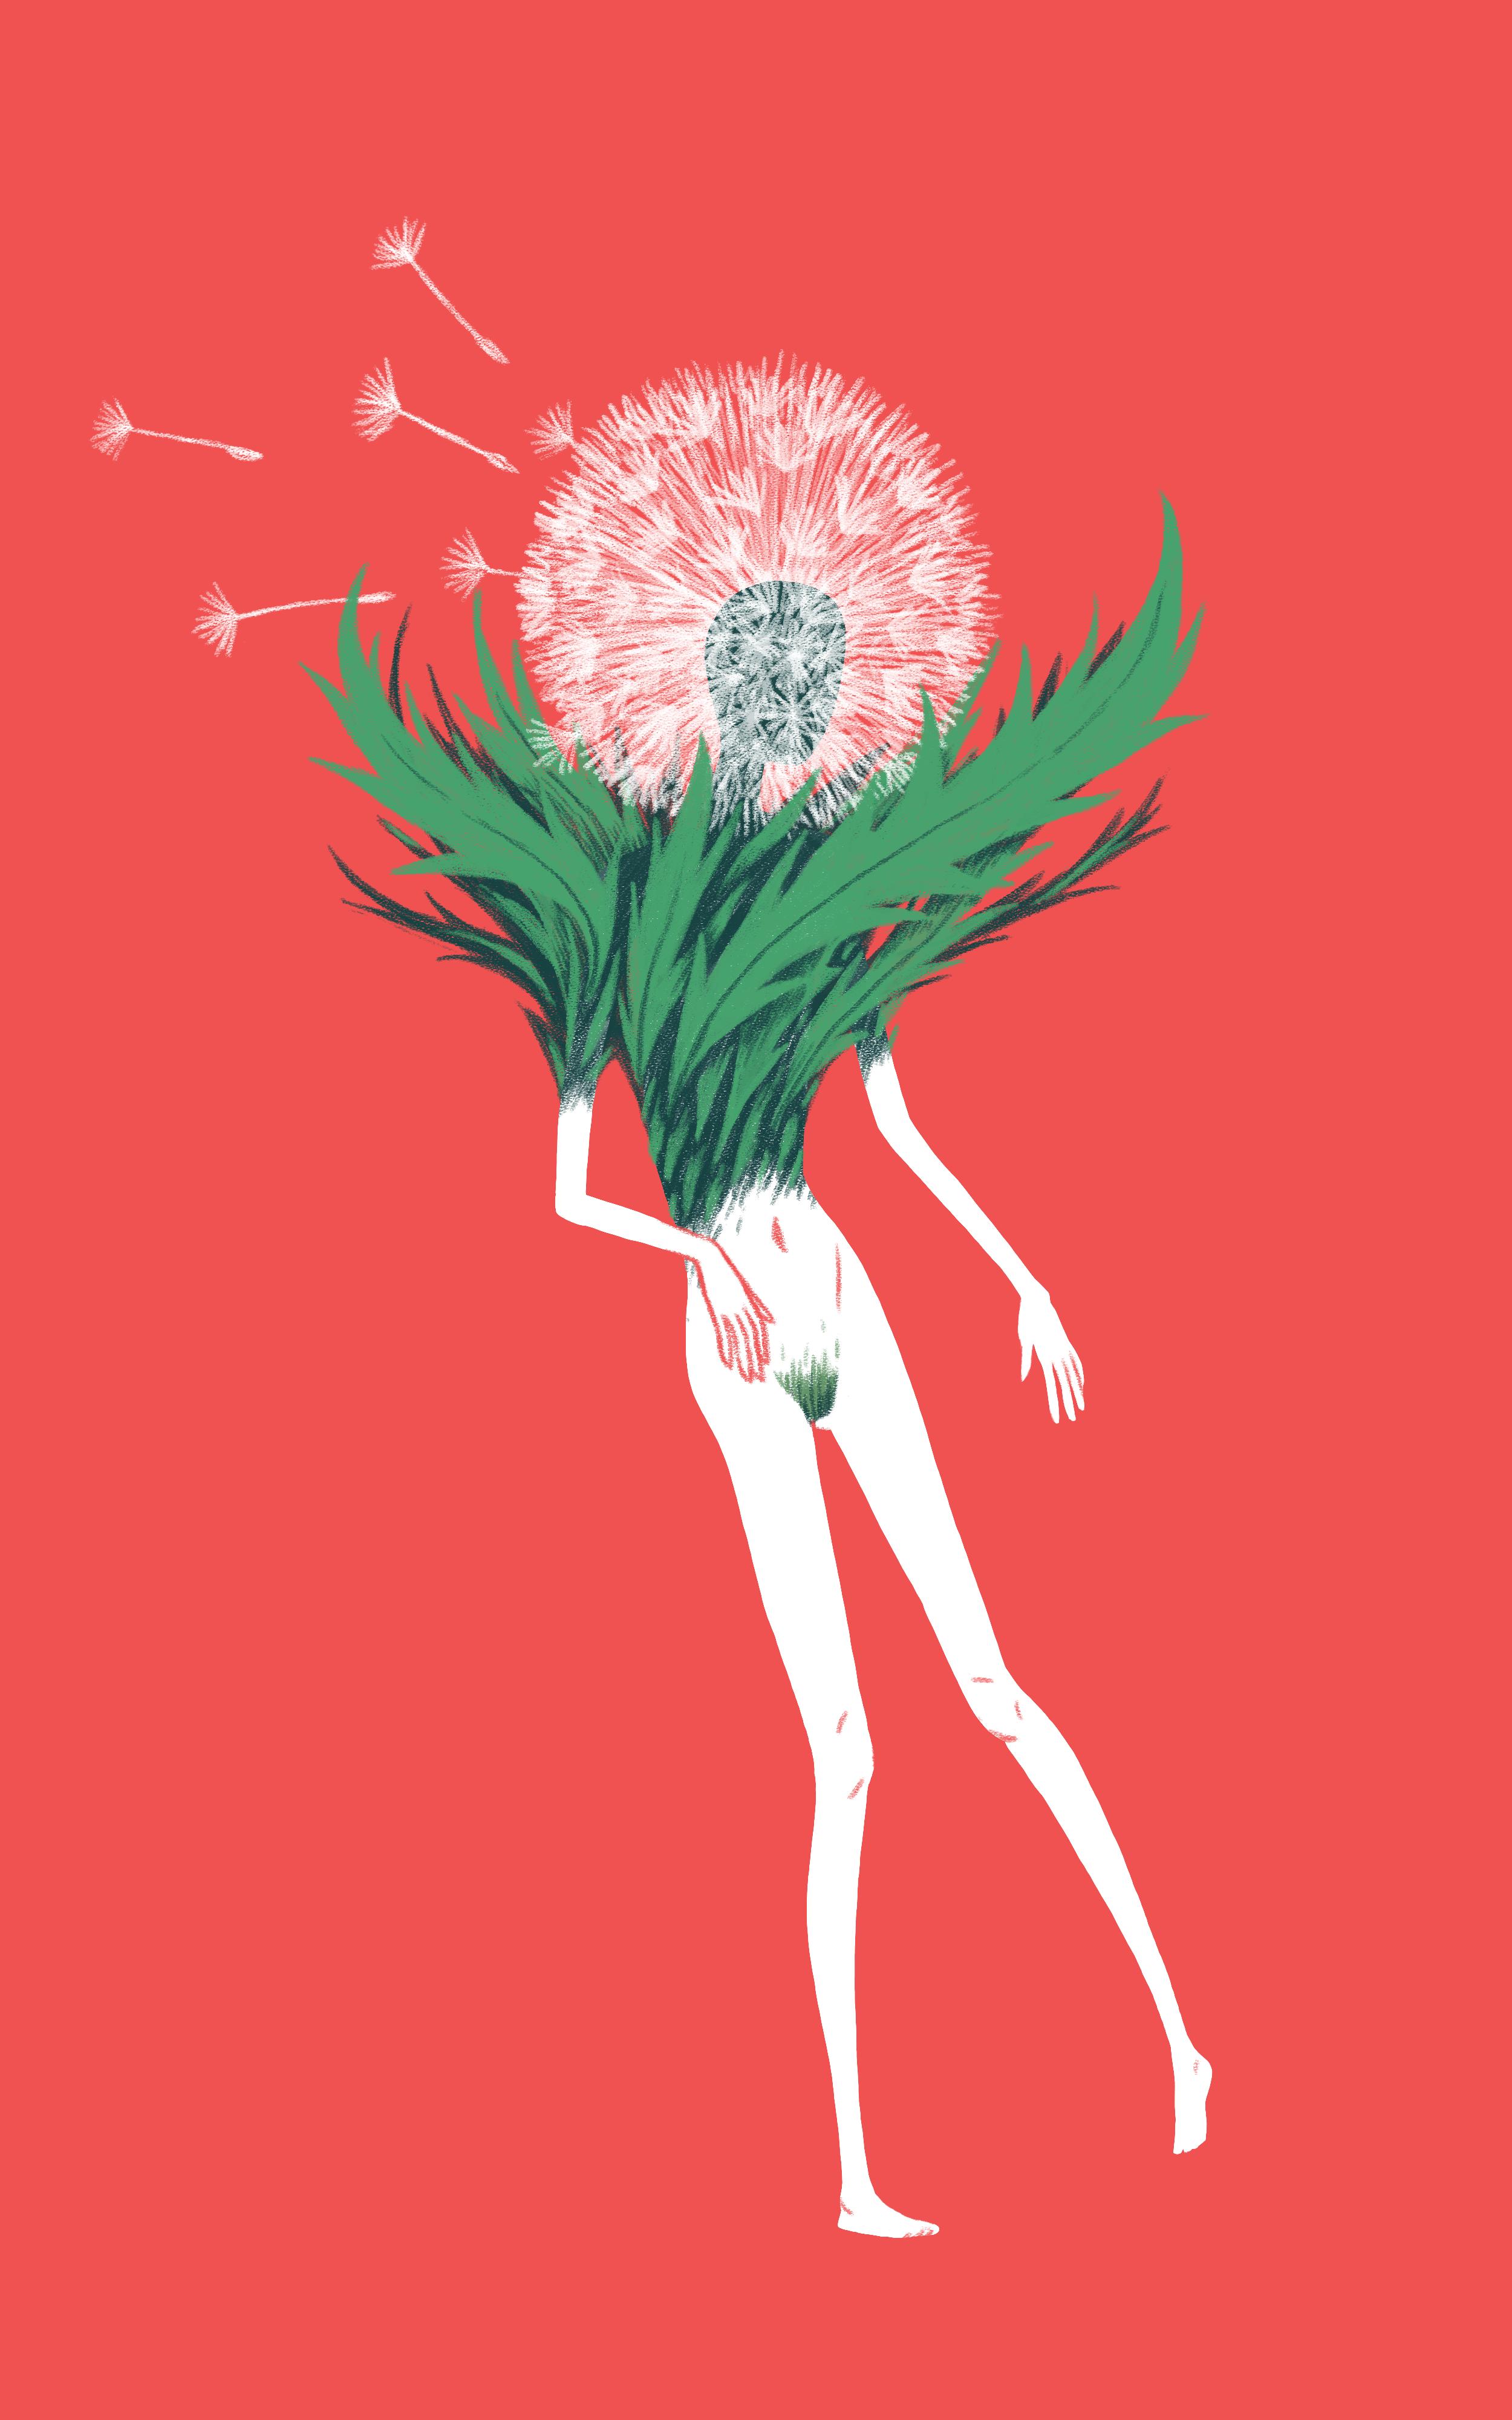 Spring Looks: Dandelion